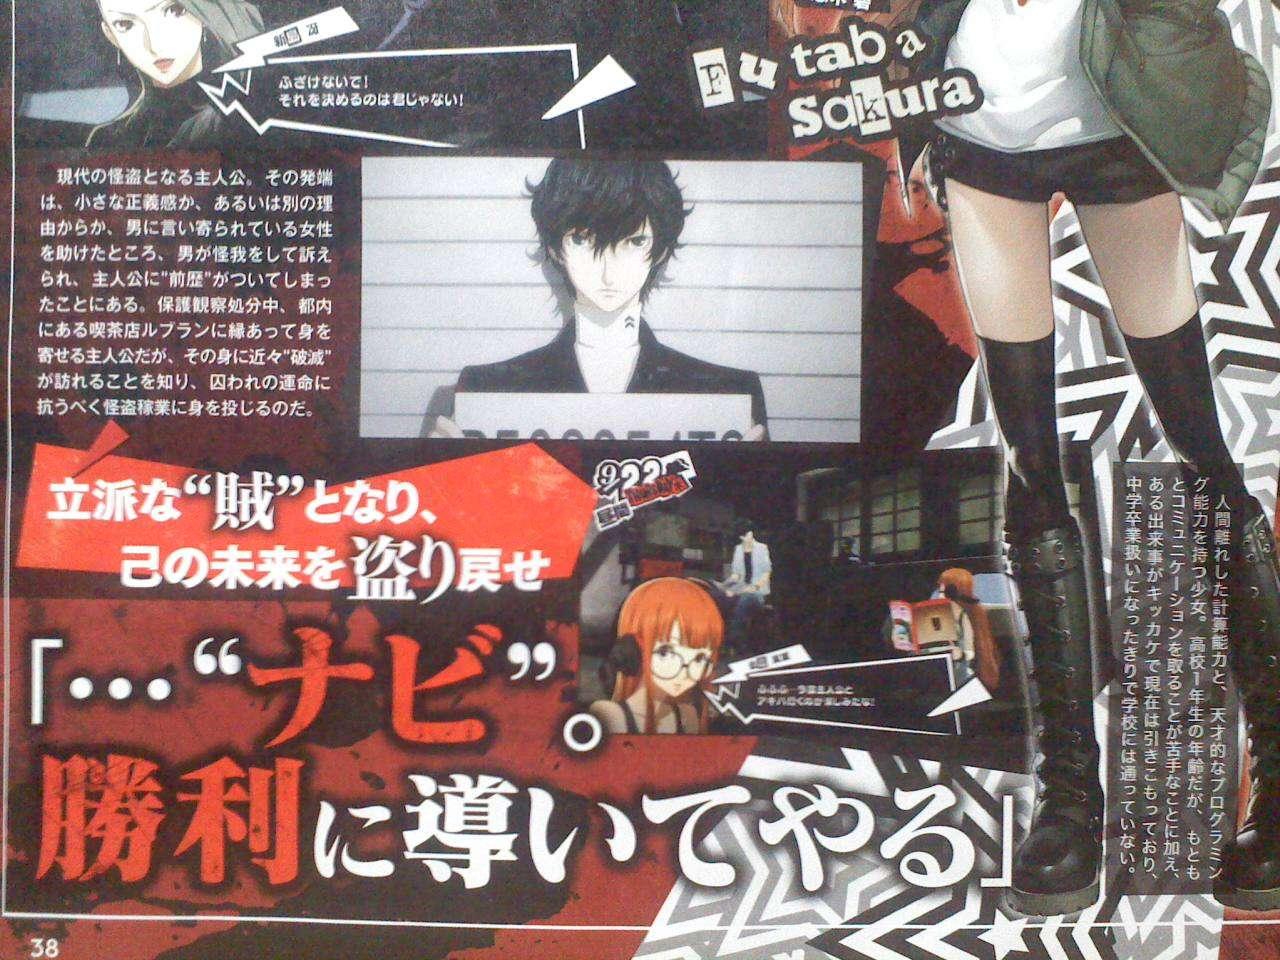 Persona-5-Famitsu-Scan-4.jpg